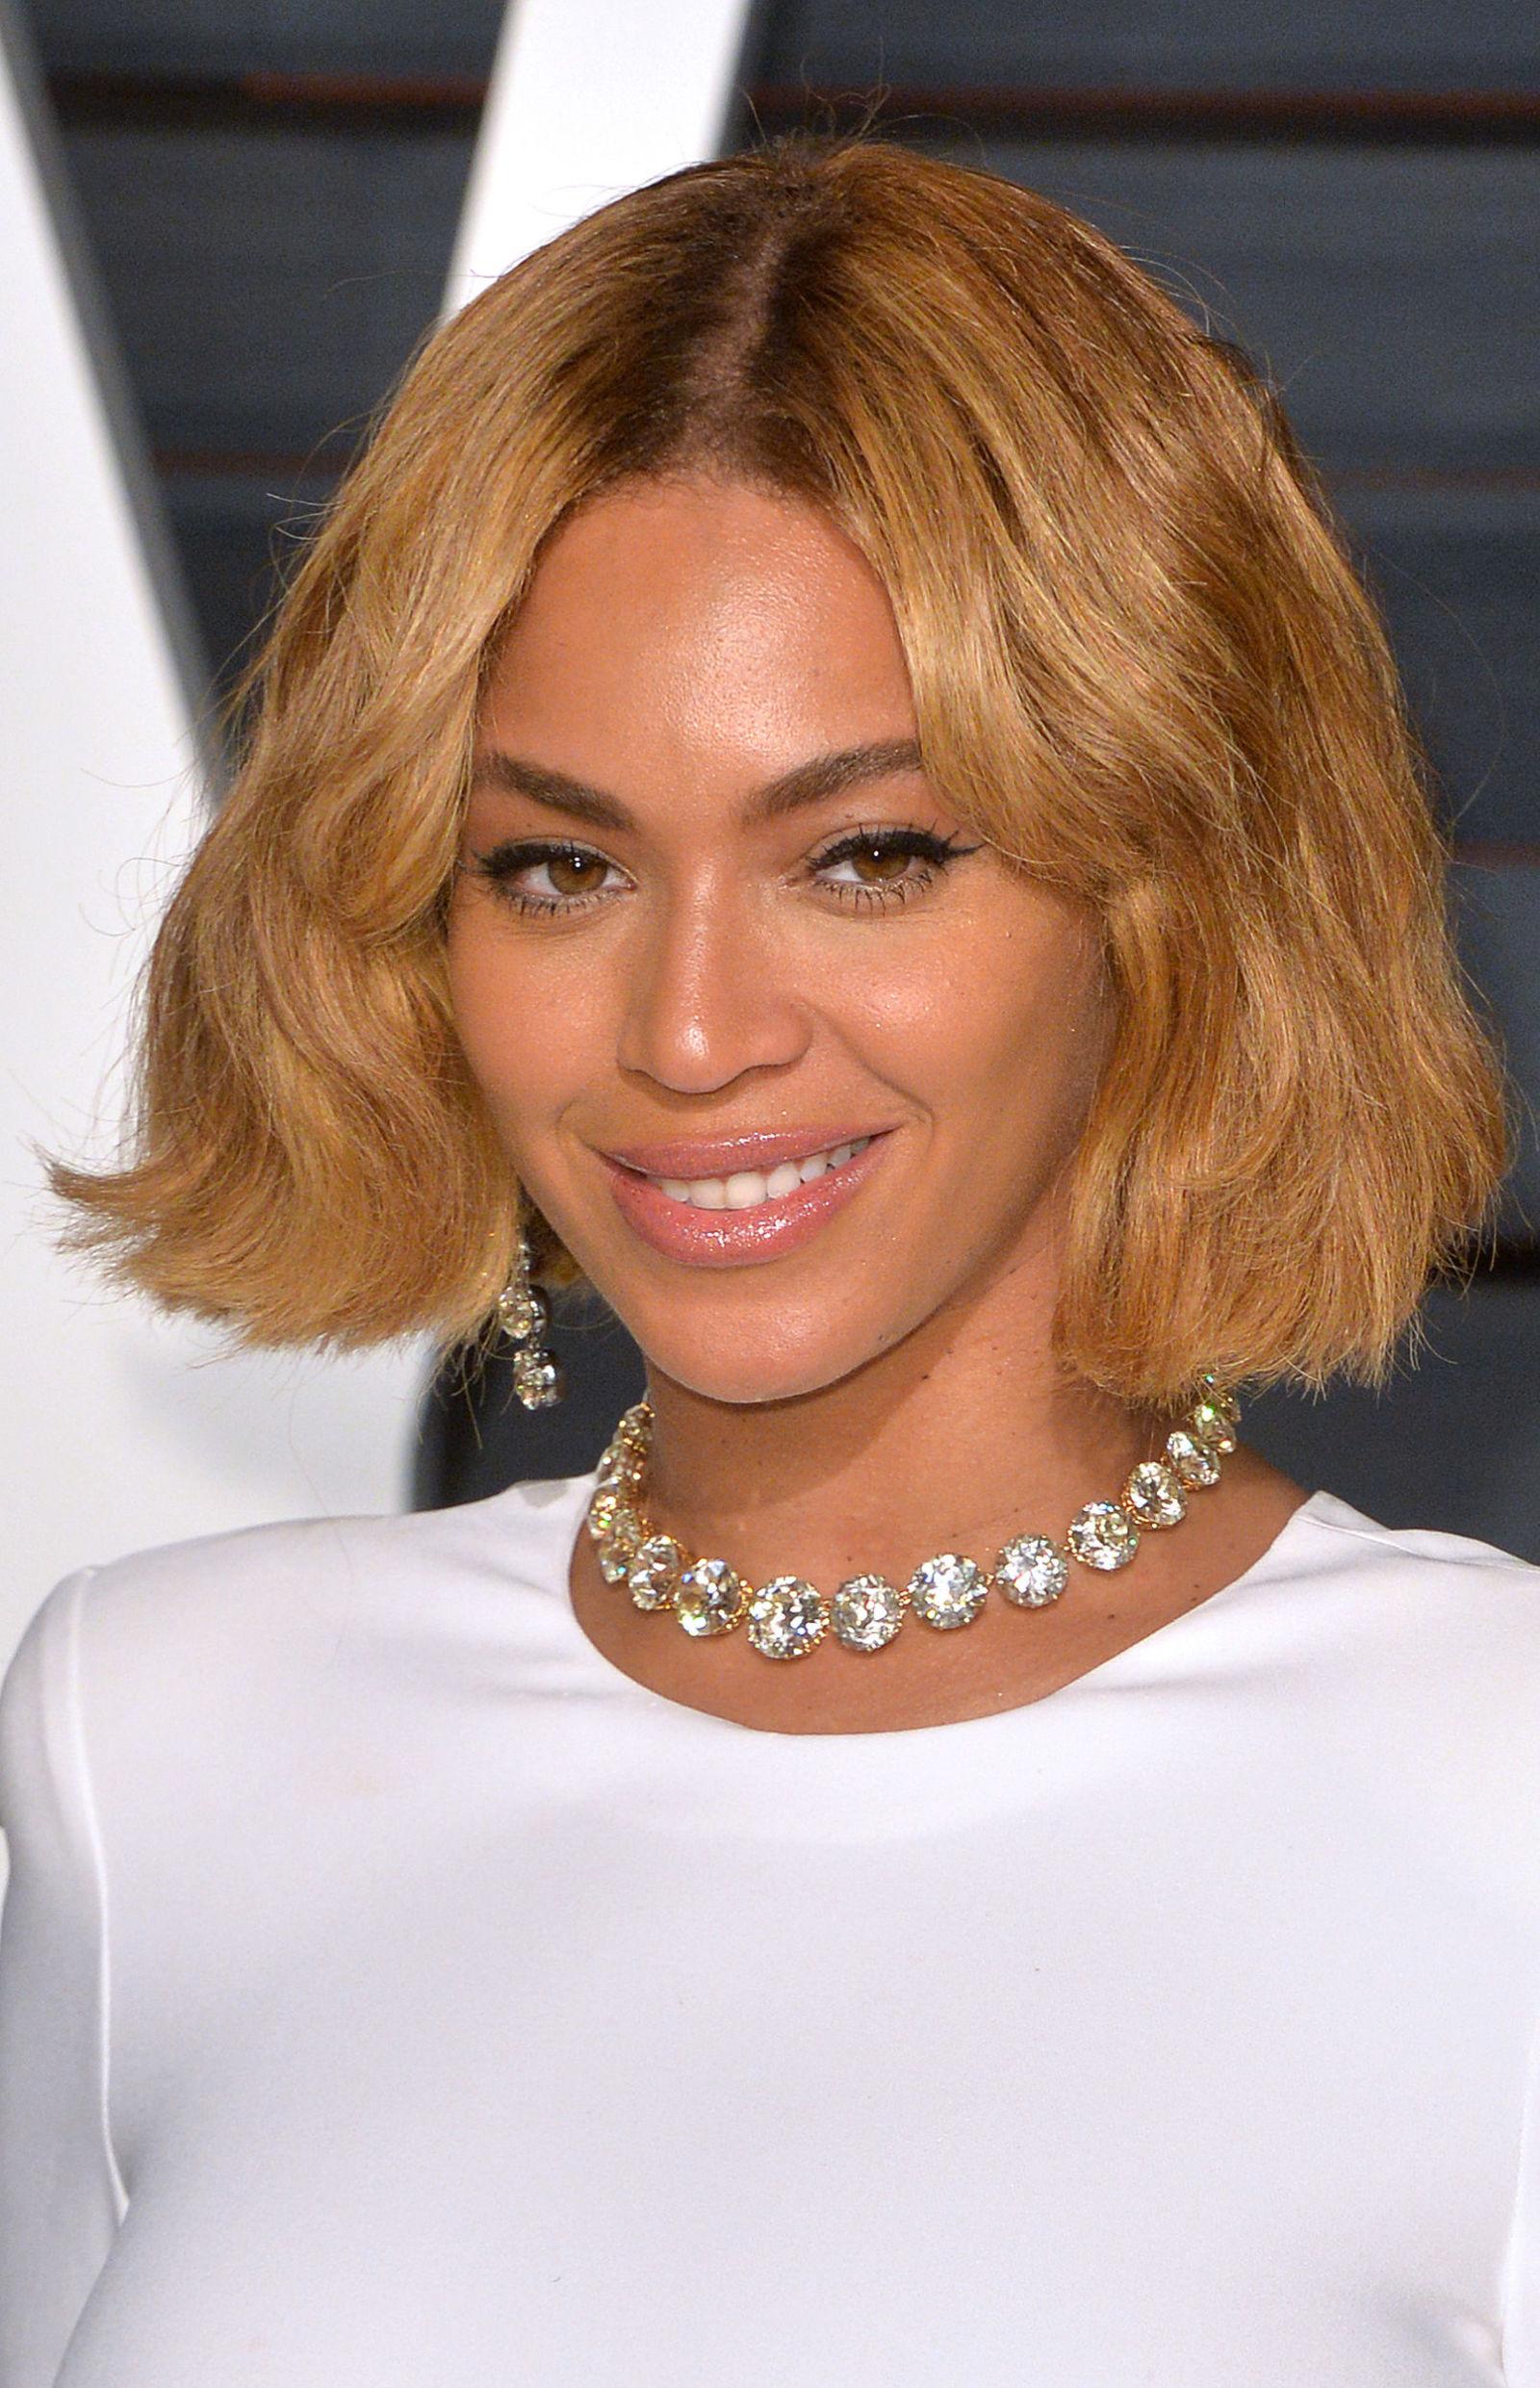 Super Short Hair Styles Beyonce Short Hair Fashions Short Hairstyles For Black Women Fulllsitofus